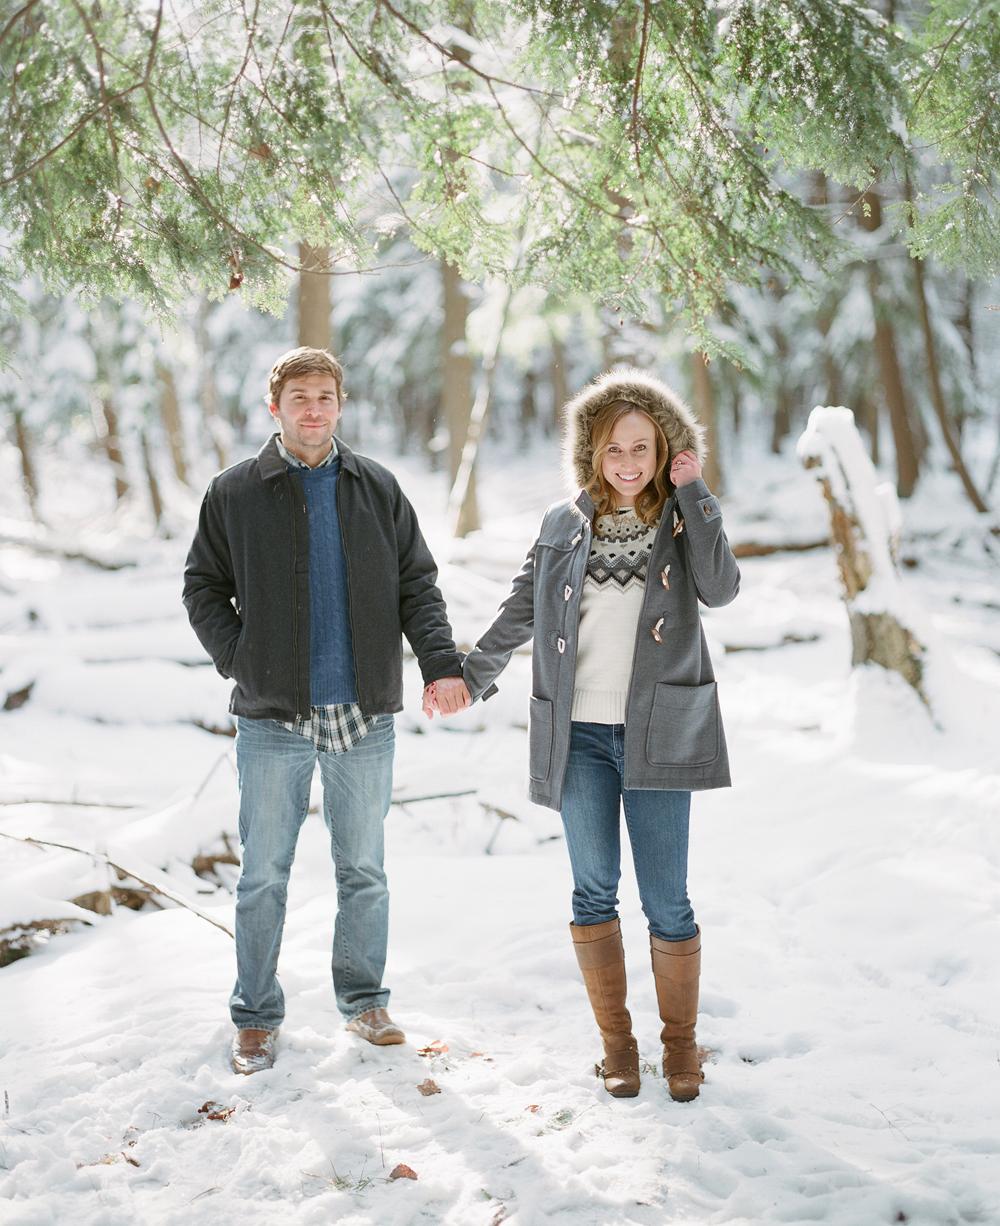 winter-engagement-photos-wausau-003.jpg